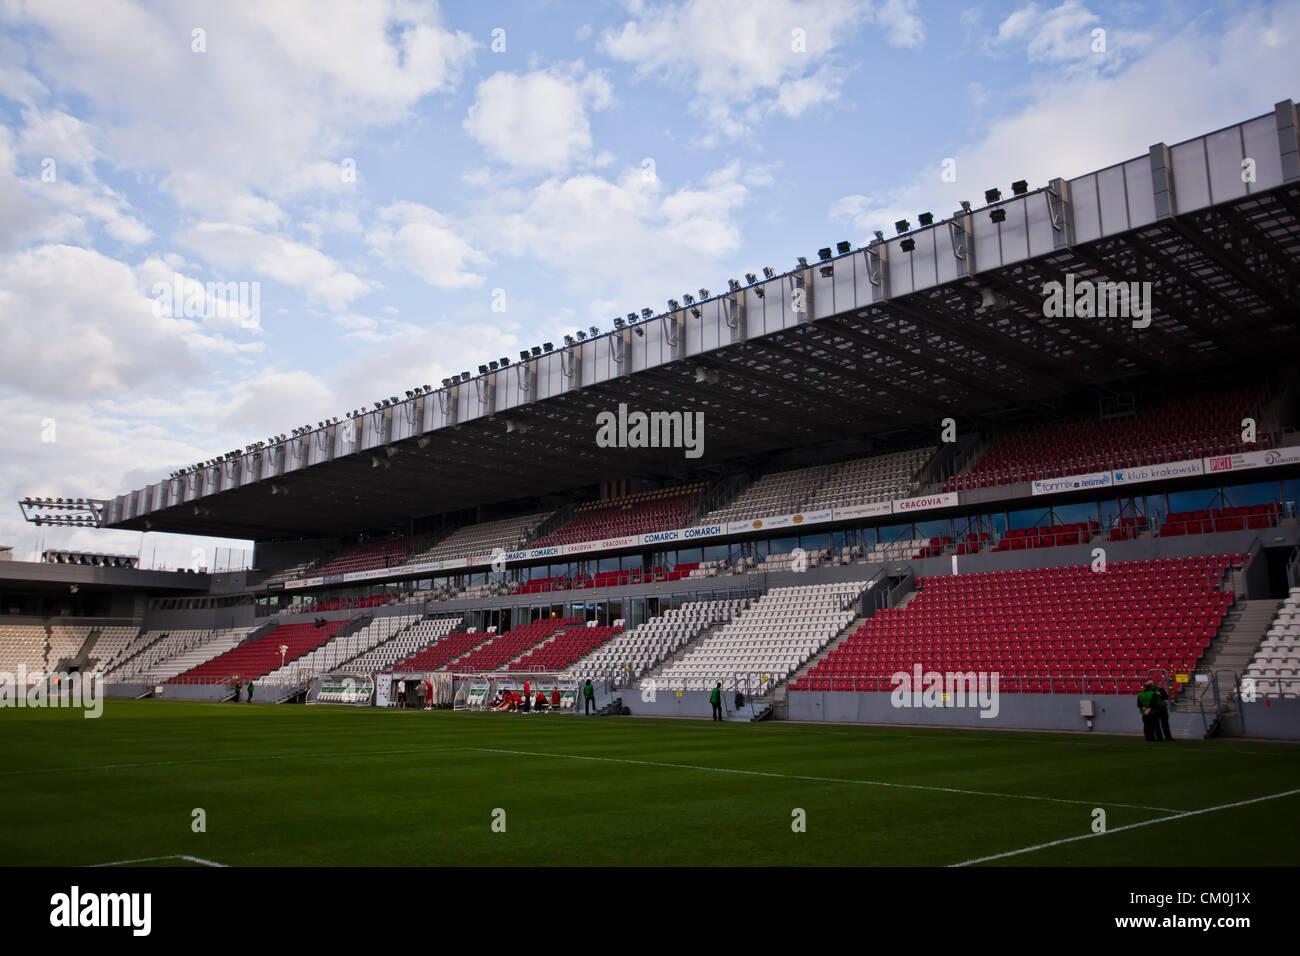 marshal jozef pilsudski stadium football stadium in krakow poland stock photo royalty free. Black Bedroom Furniture Sets. Home Design Ideas